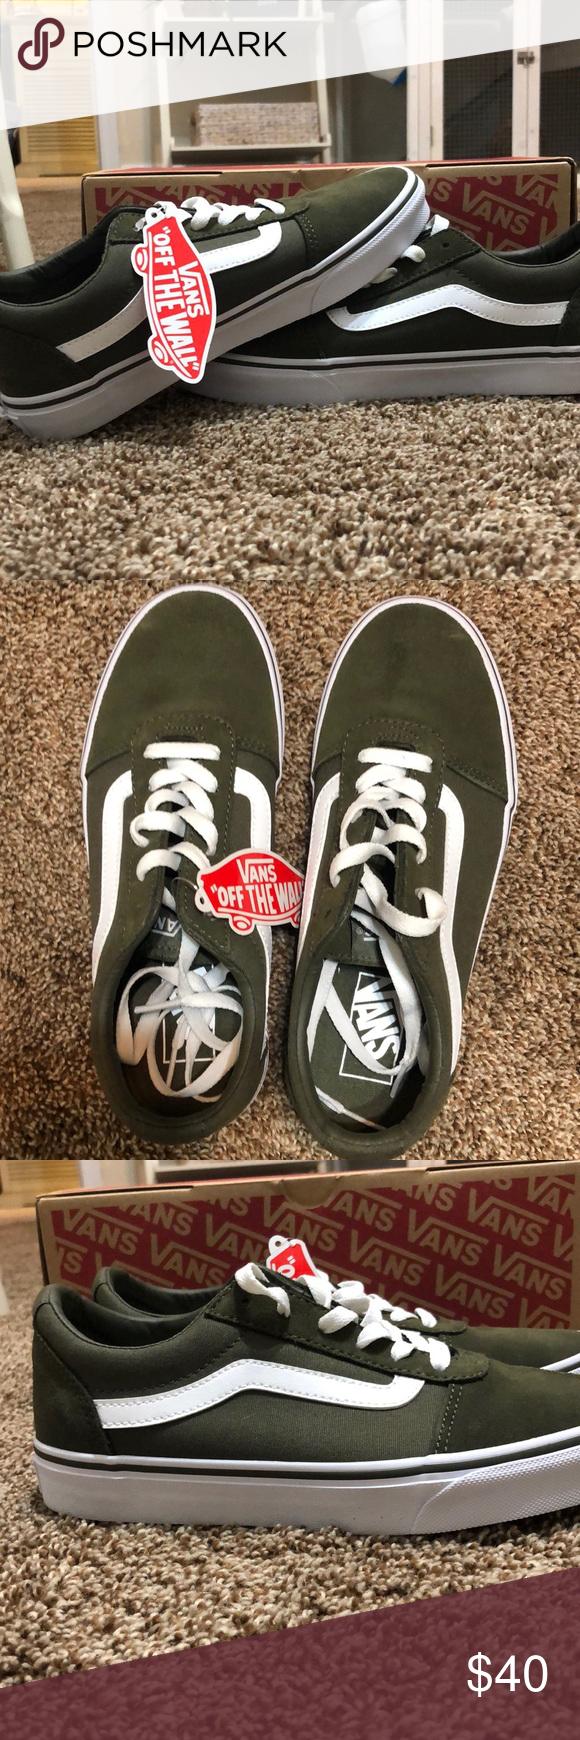 992bceaaf3bc NWT never worn vans old skool 7.5 Dark green suede canvas women s 7.5  (men s 6) Vans Shoes Sneakers